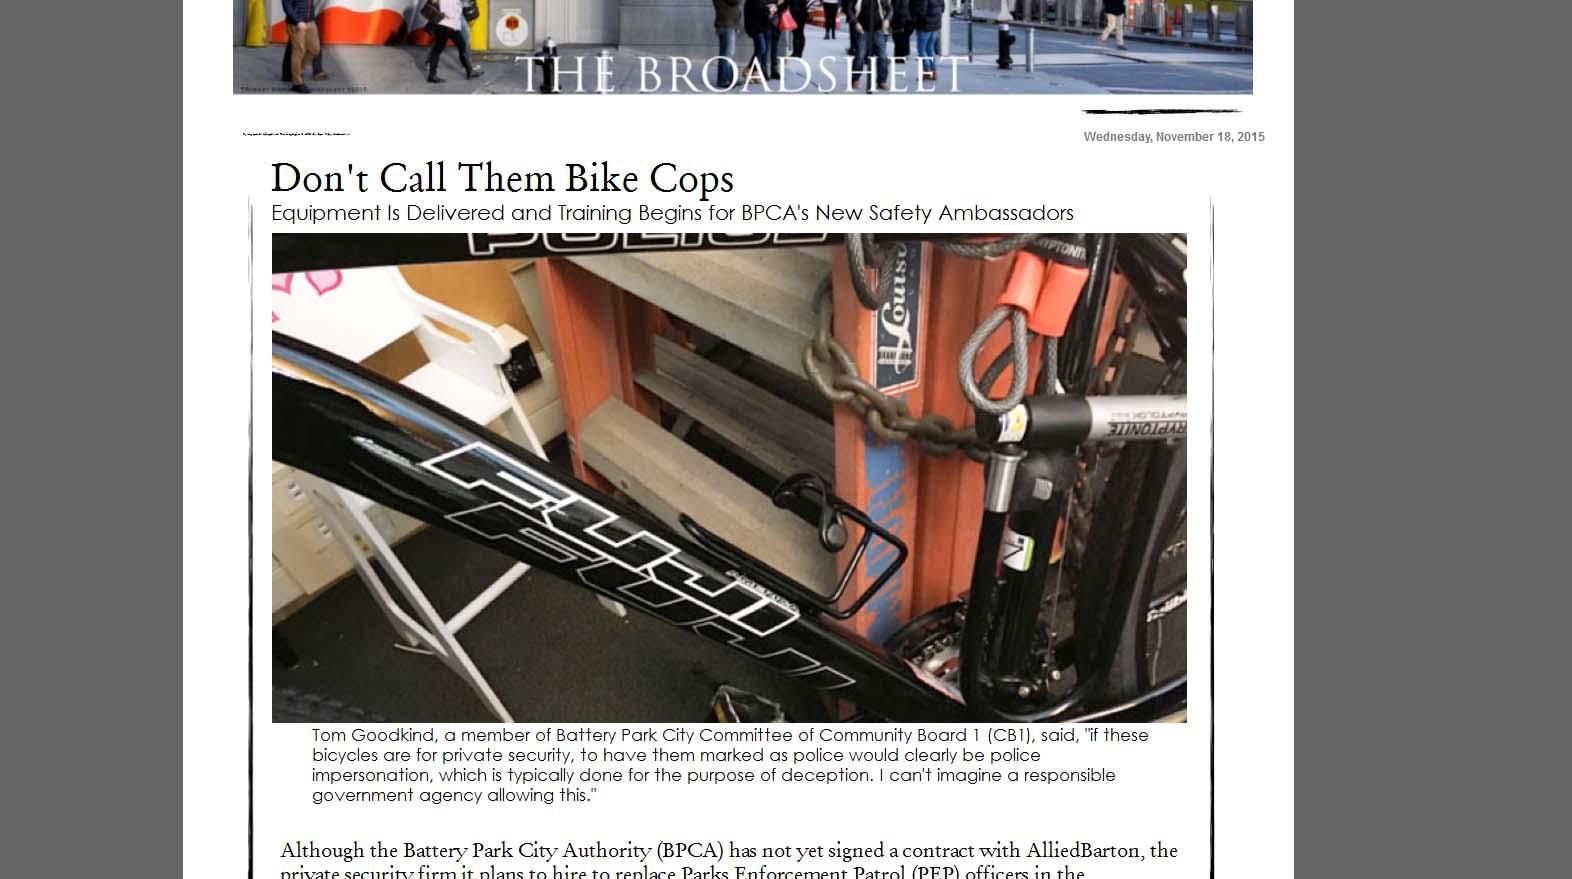 Broadsheet story on police bikes